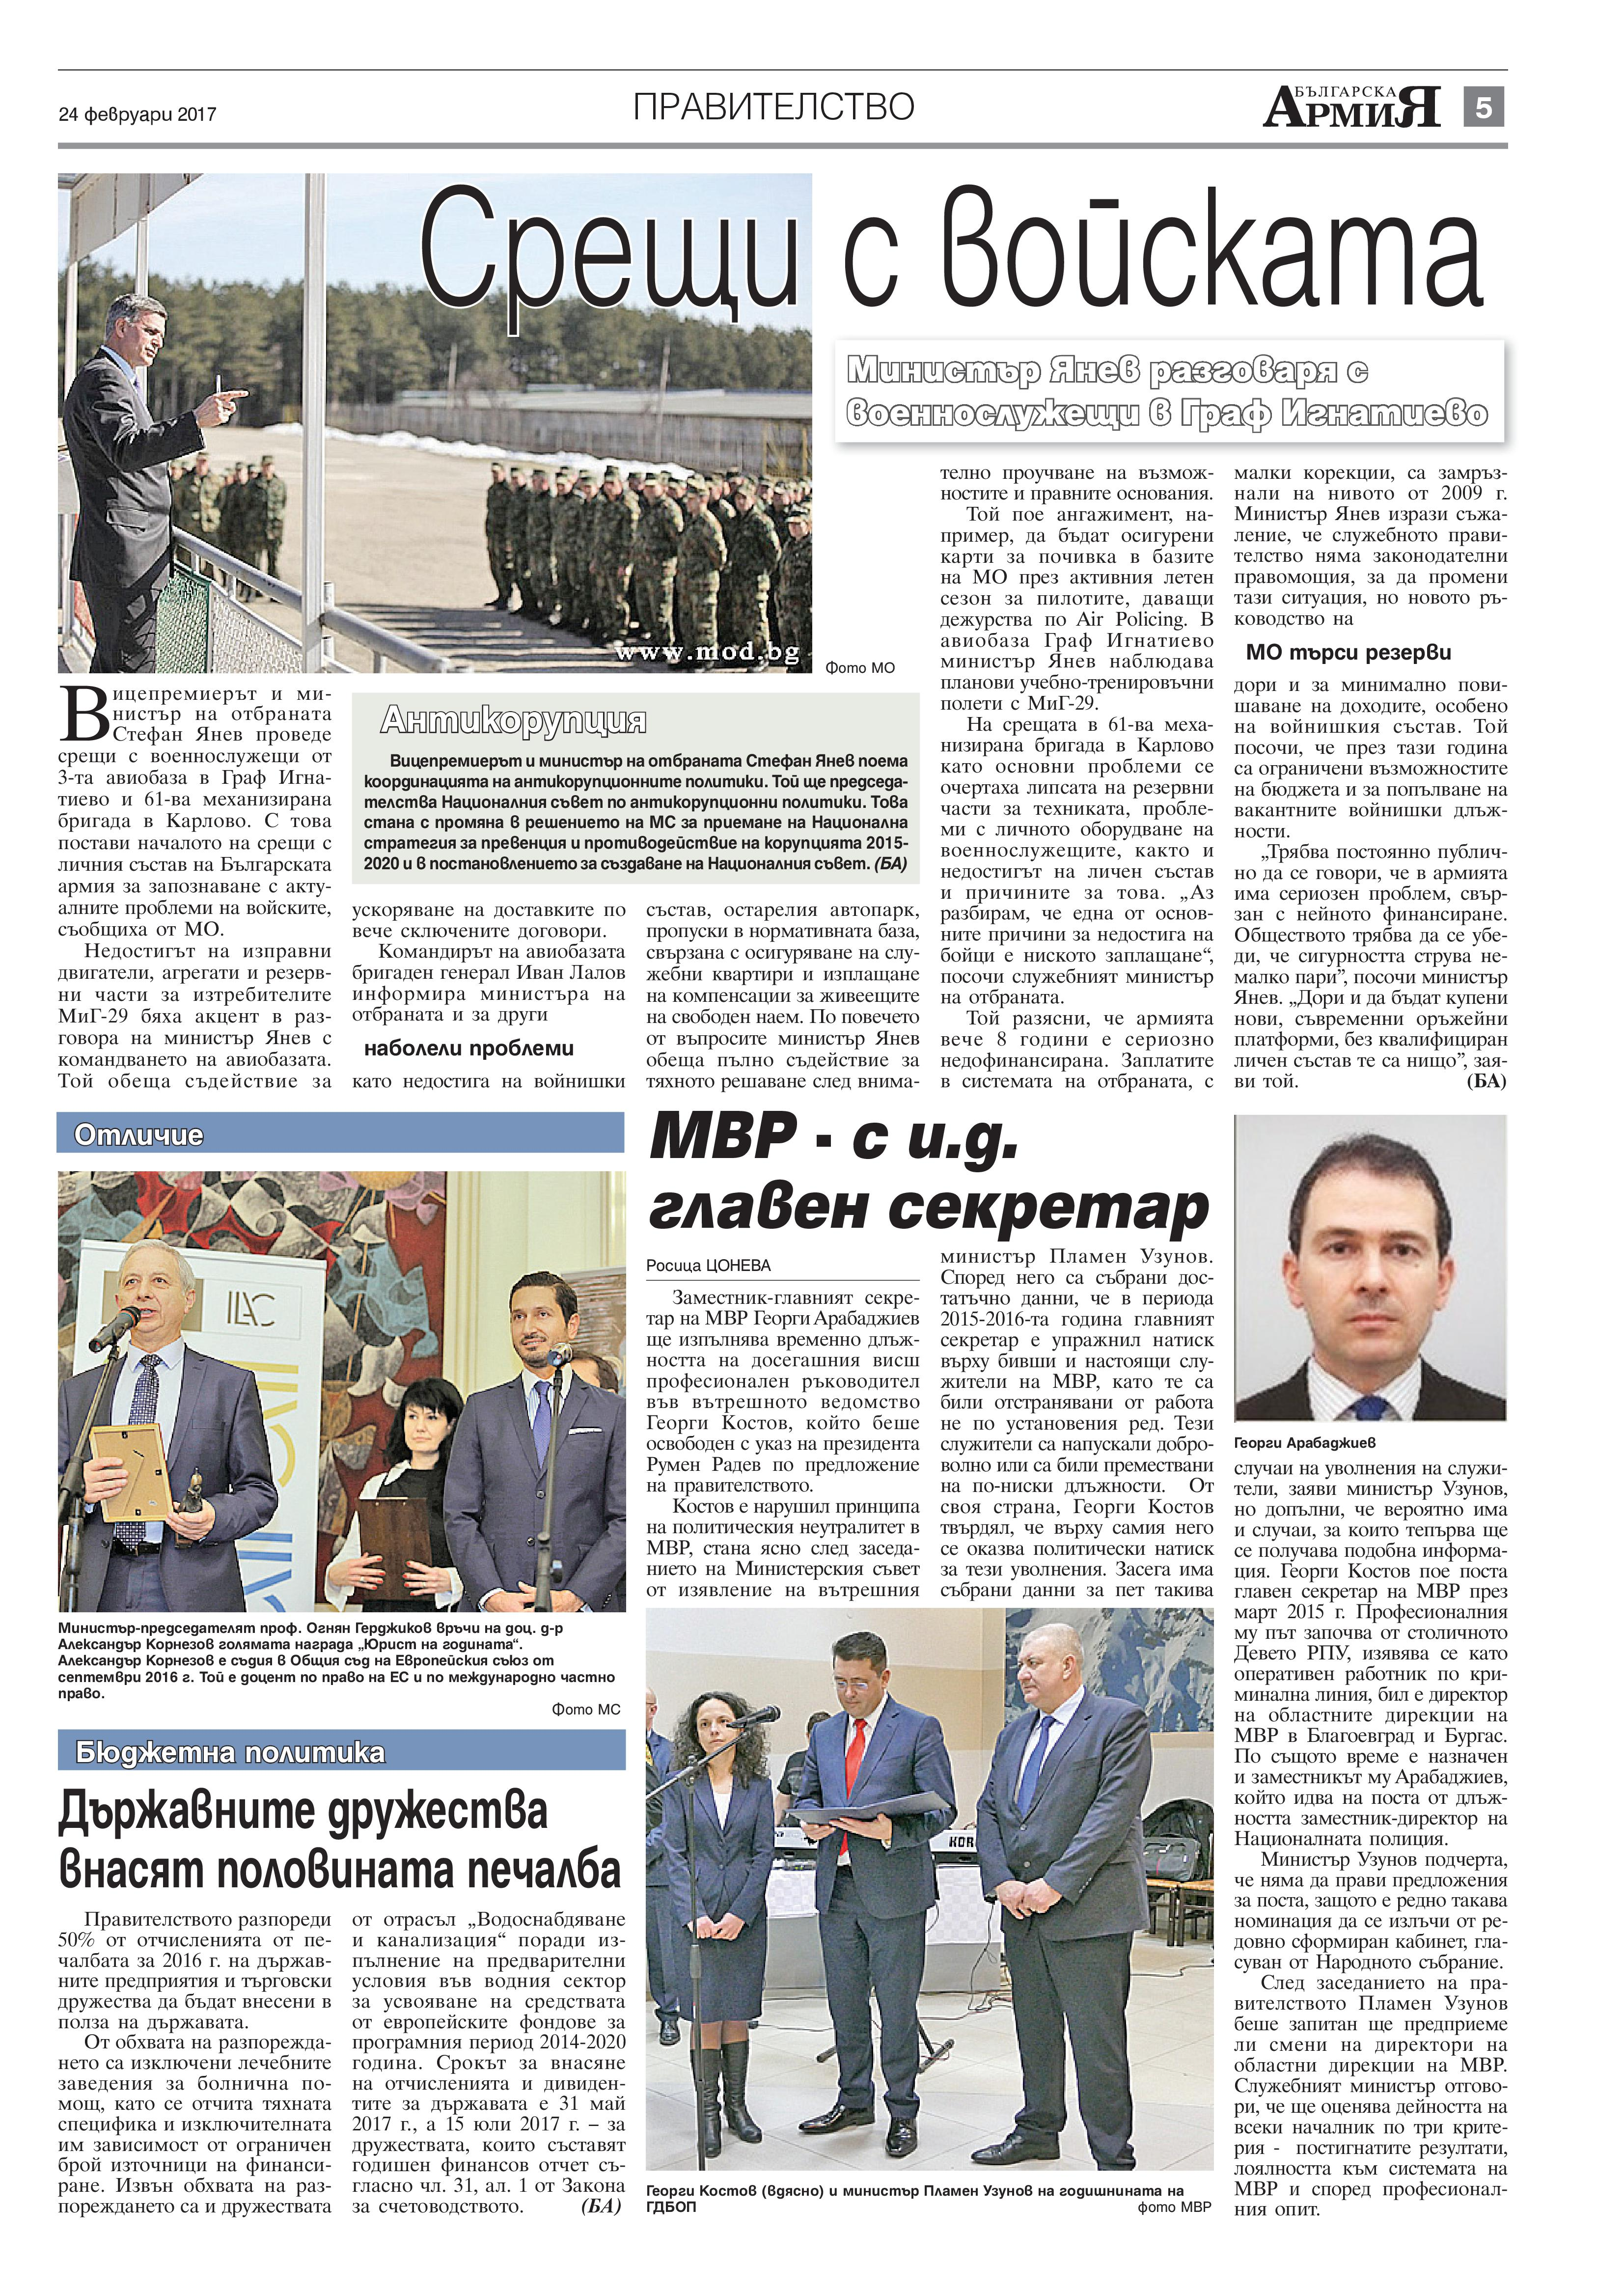 https://www.armymedia.bg/wp-content/uploads/2017/02/05-1.jpg